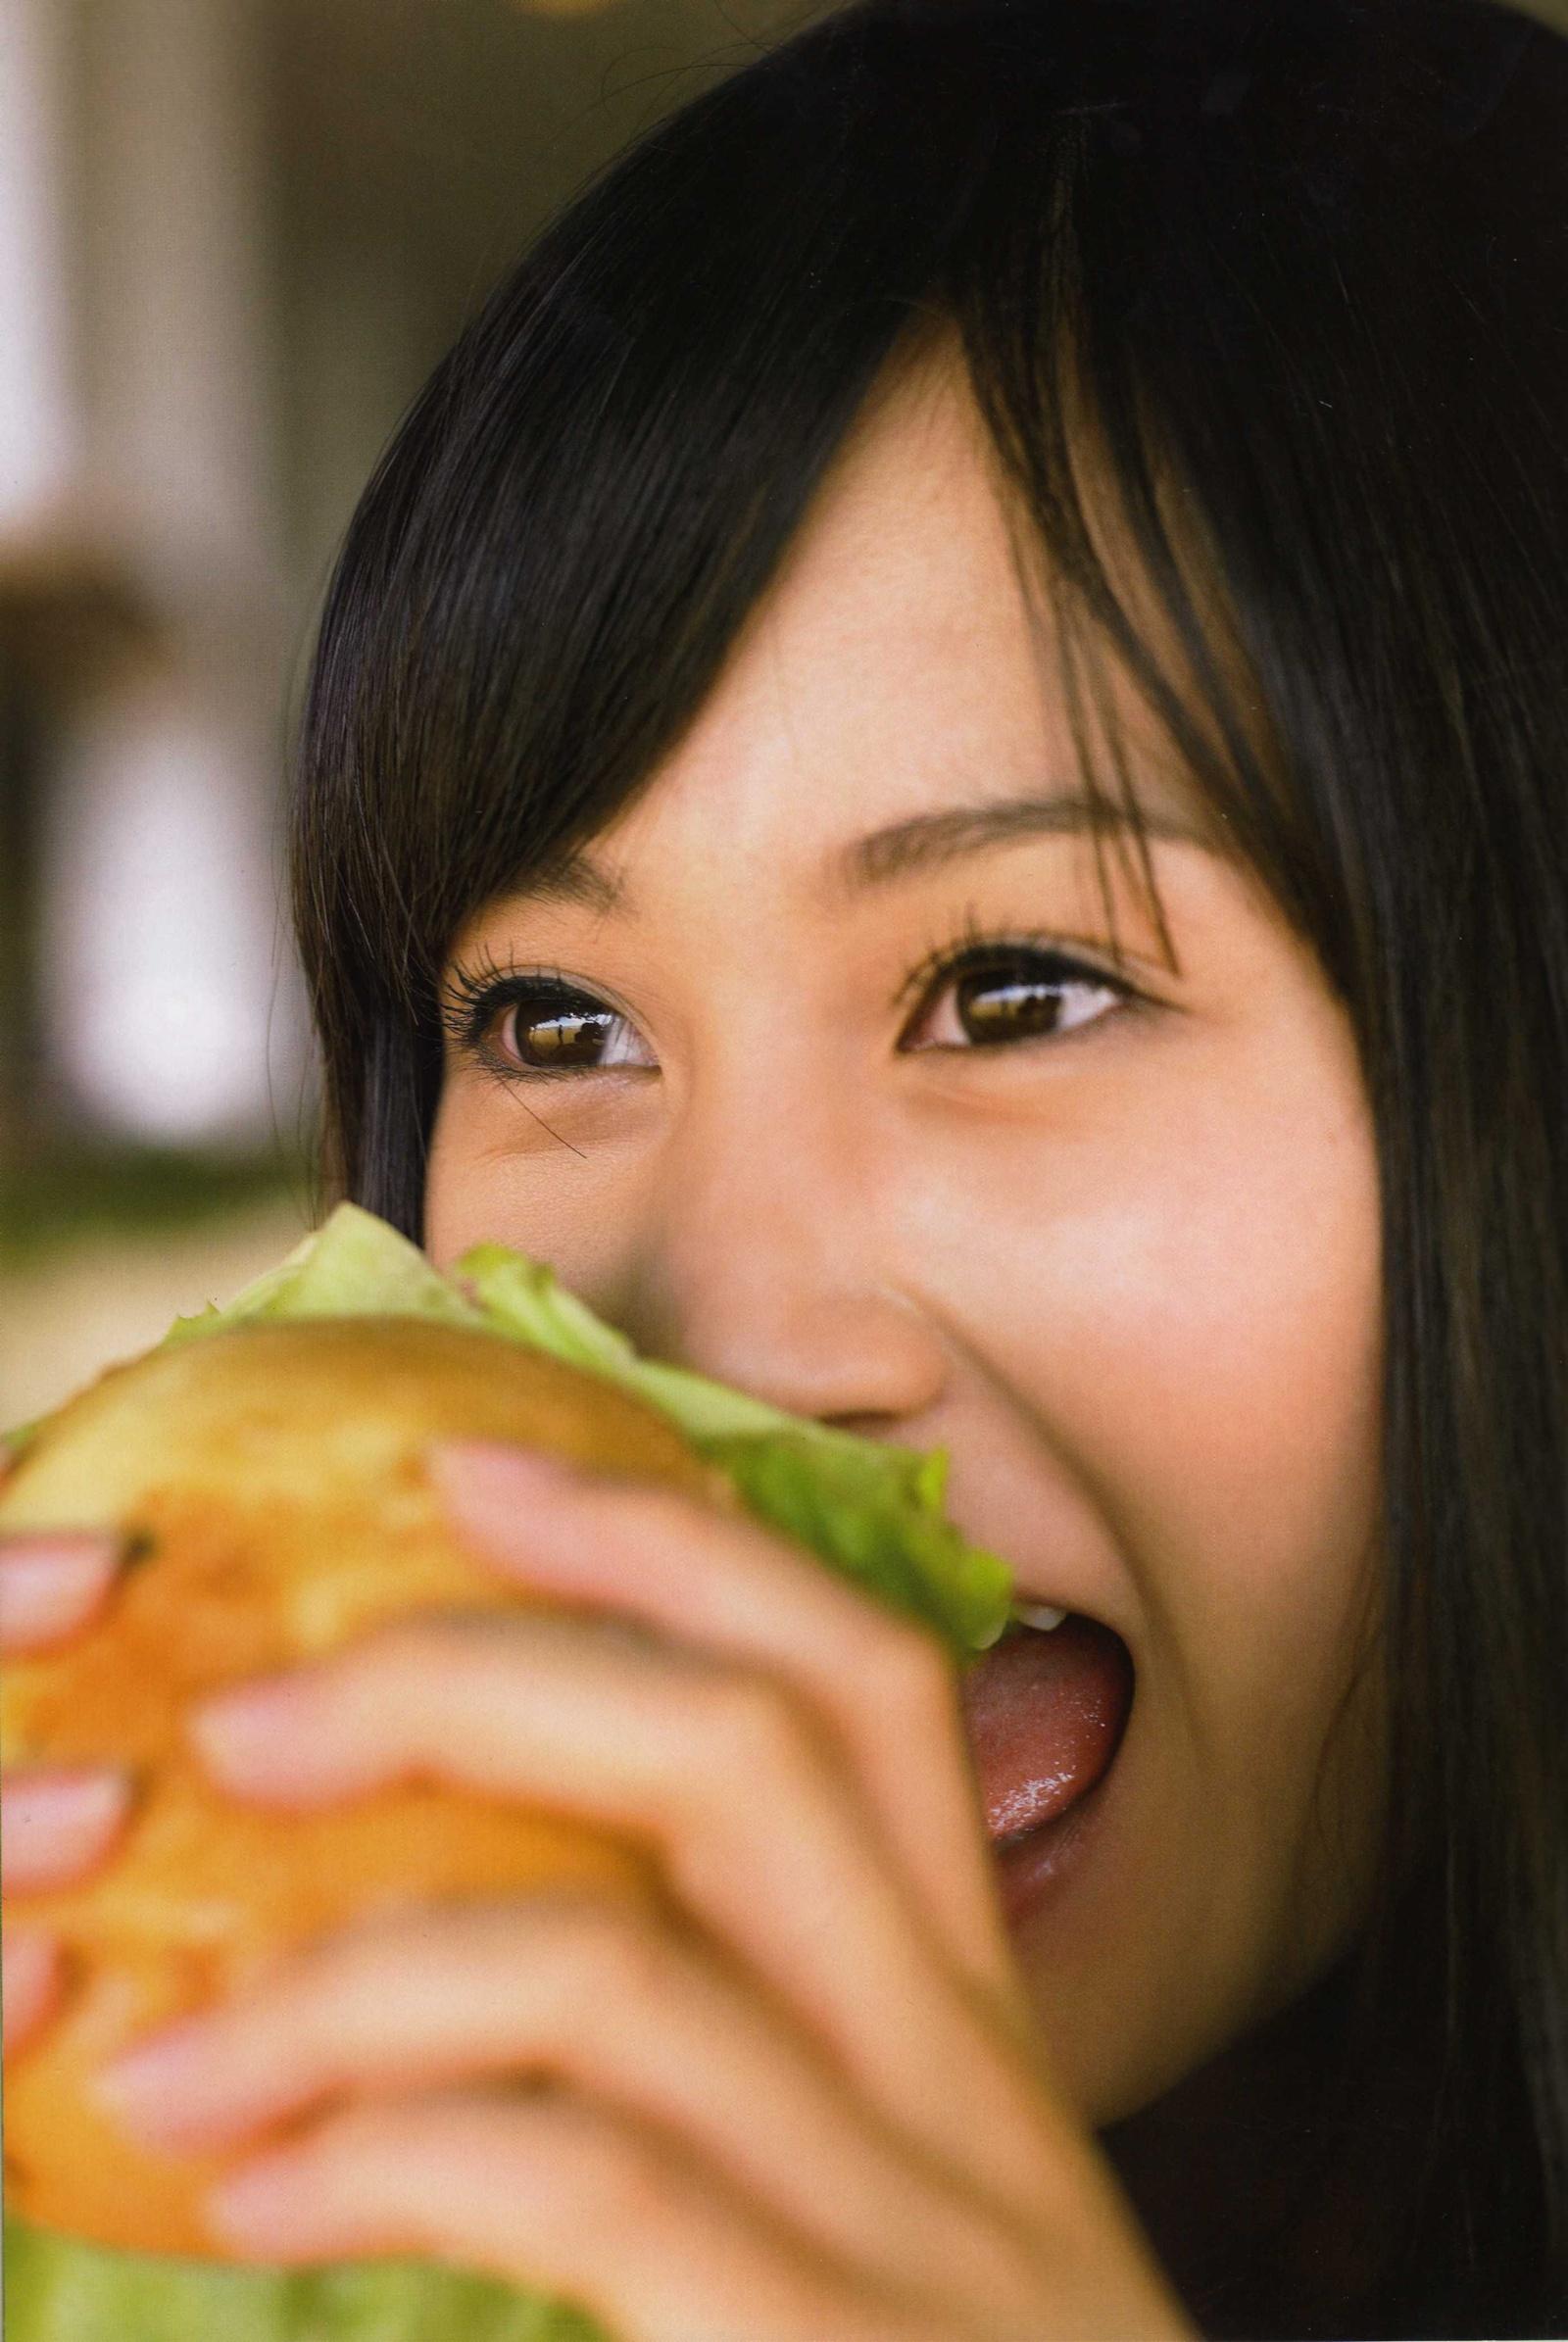 Atsuko Maeda (AKB48) png [render] by Sellscarol on DeviantArt